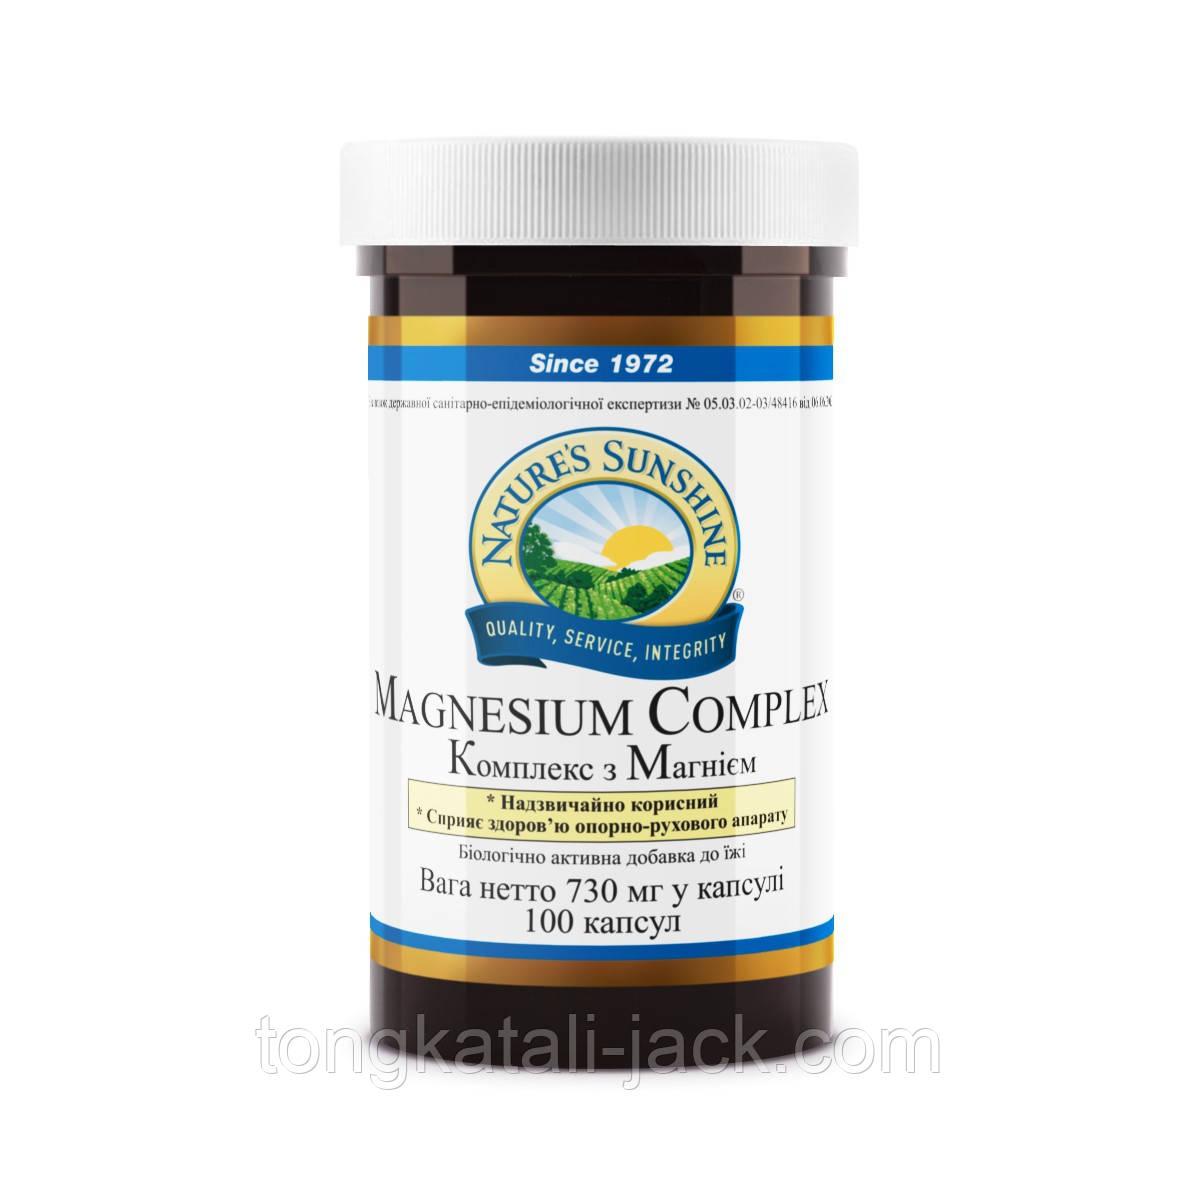 Магний Хелат (Magnesium complex)